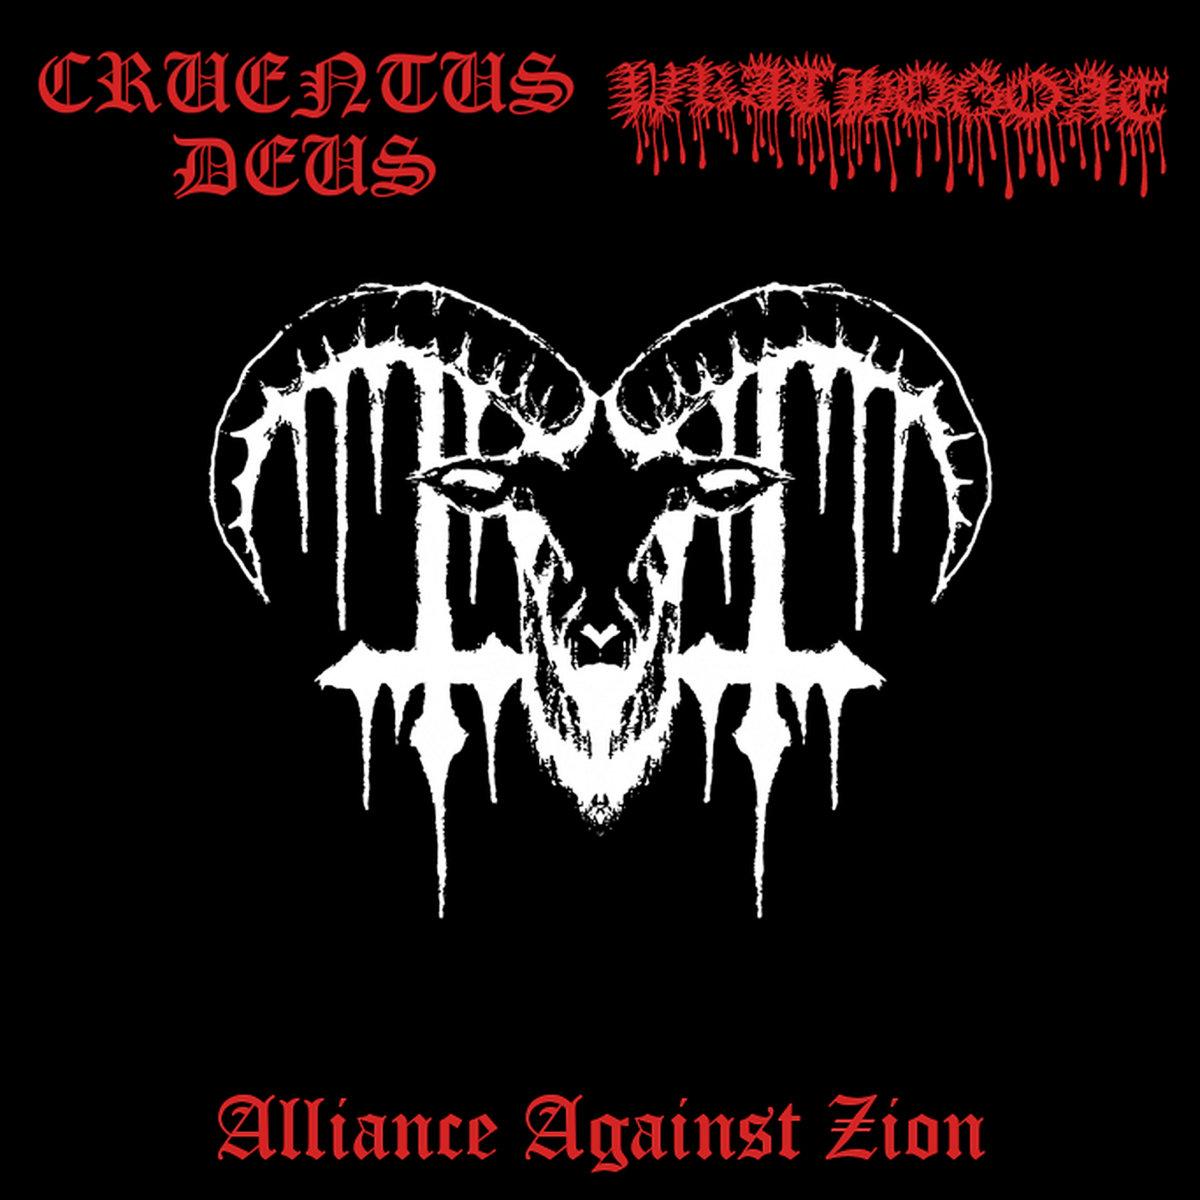 Cruentus Deus / Wrathogoat - Alliance Against Zion